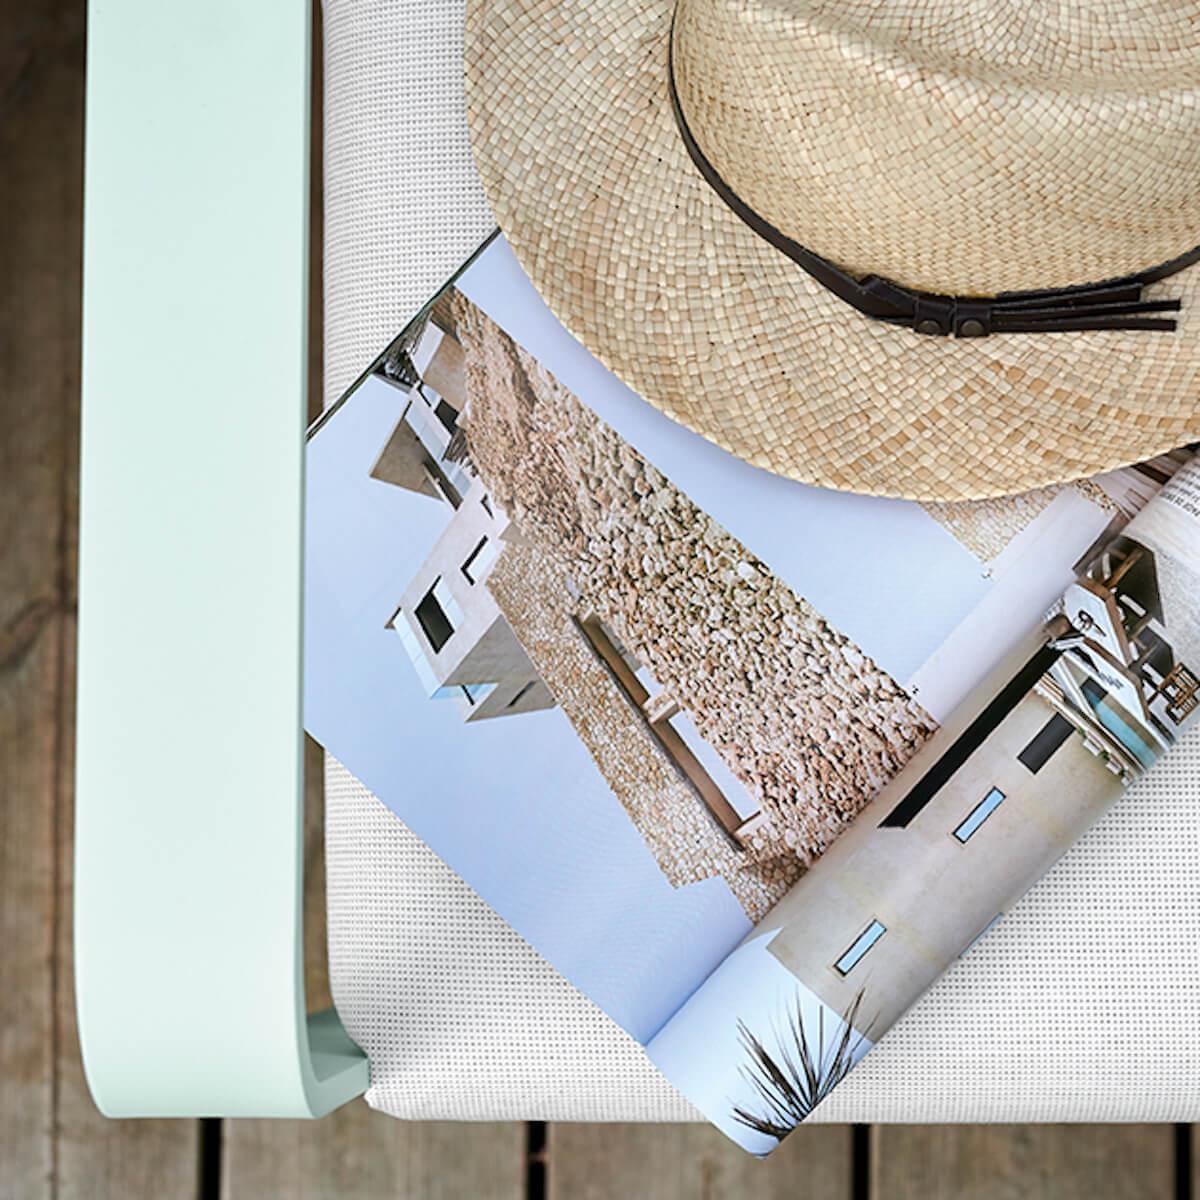 Fauteuil de jardin BELLEVIE Fermob vert opaline-blanc grisé